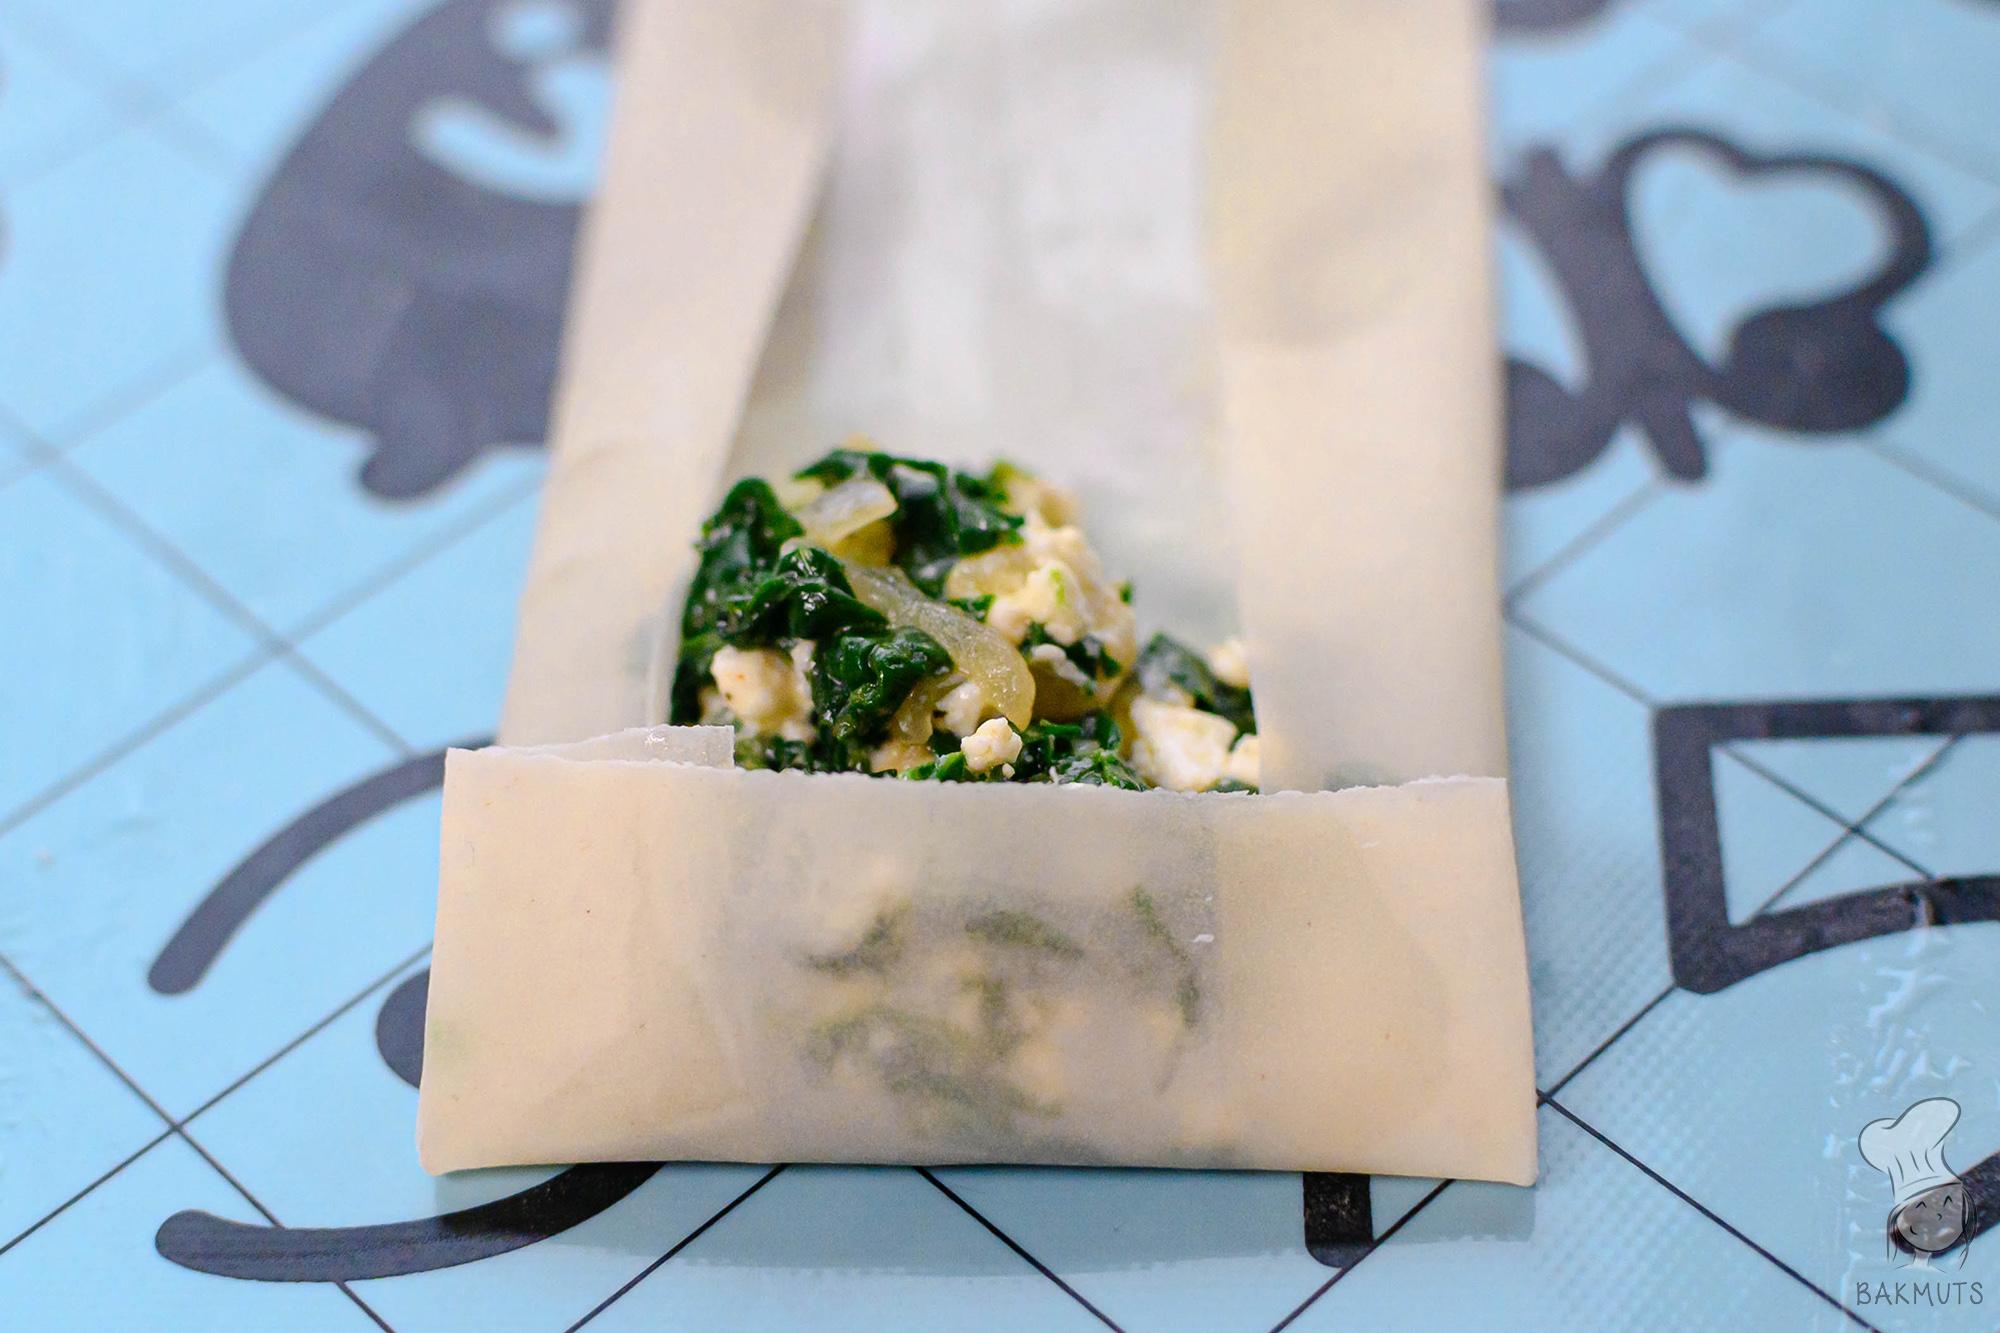 Spinaziefetarolletjes recept van Bakmuts